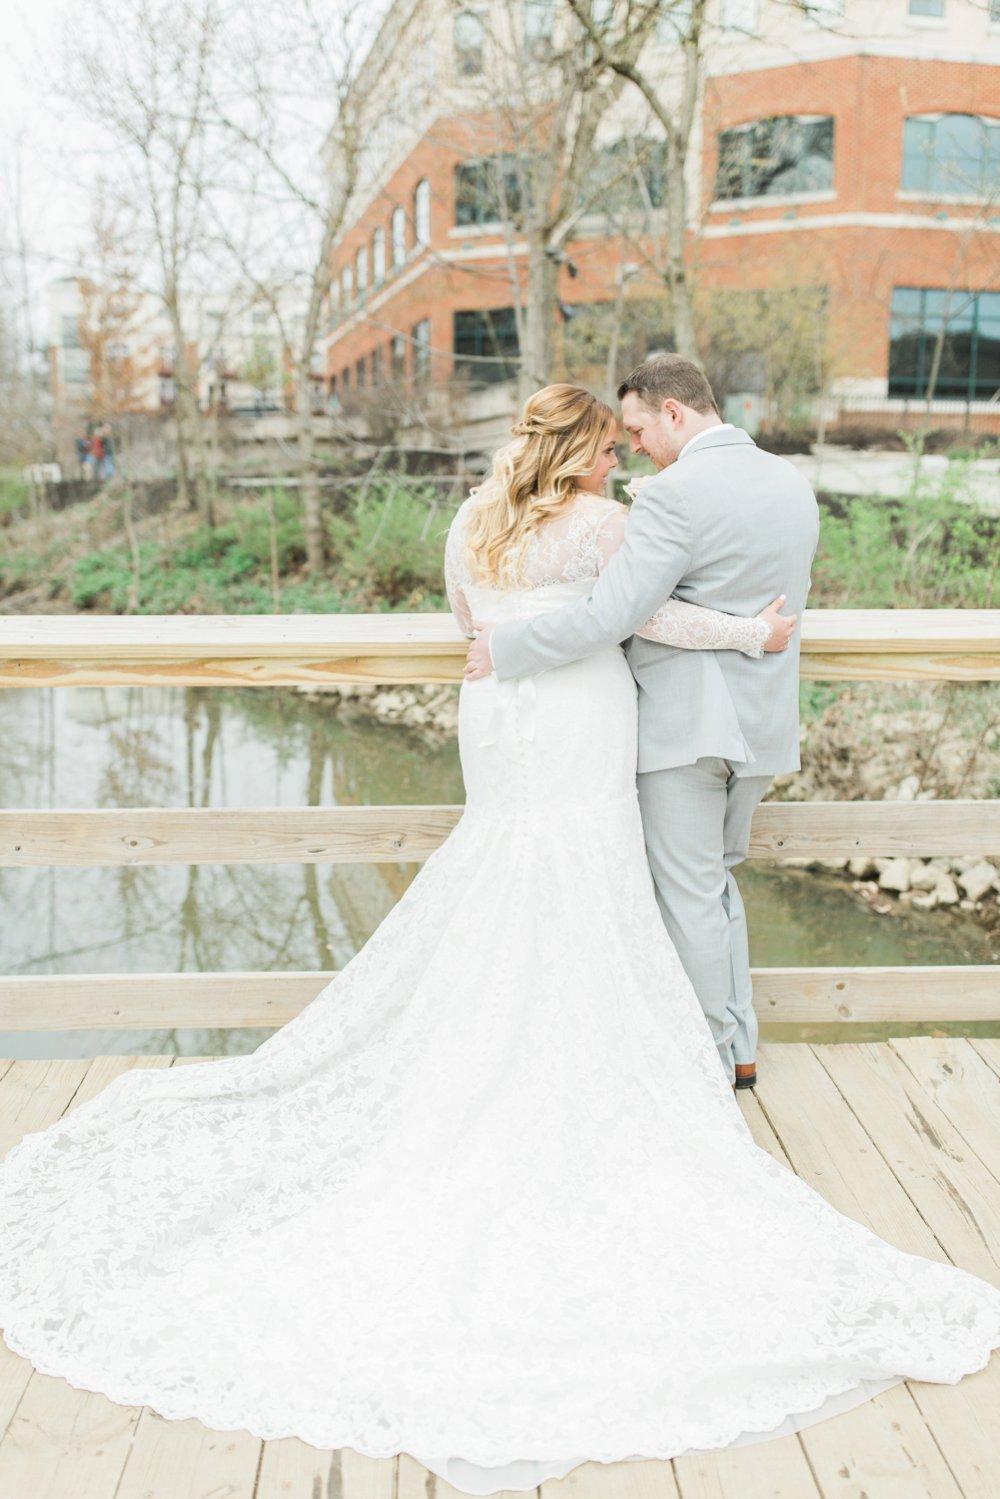 creekside-gahanna-ohio-wedding-melissa-matt_0064.jpg